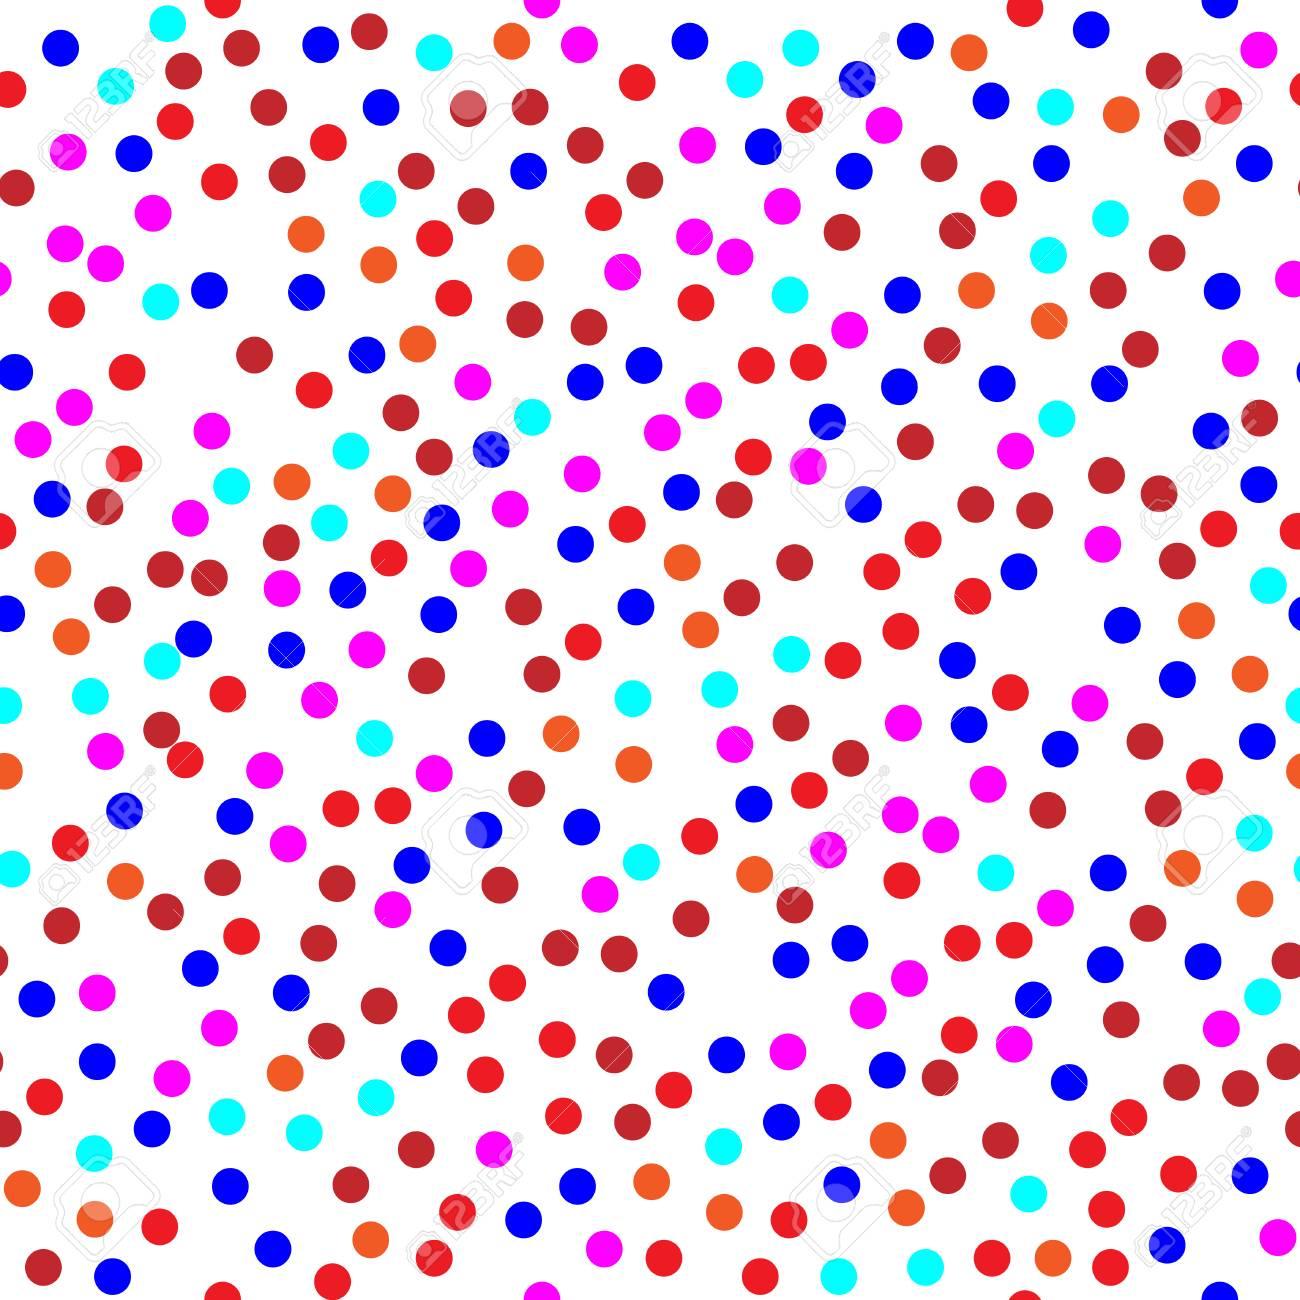 Sparkling Textured Backdrop For Design Web Wallpaper Gift